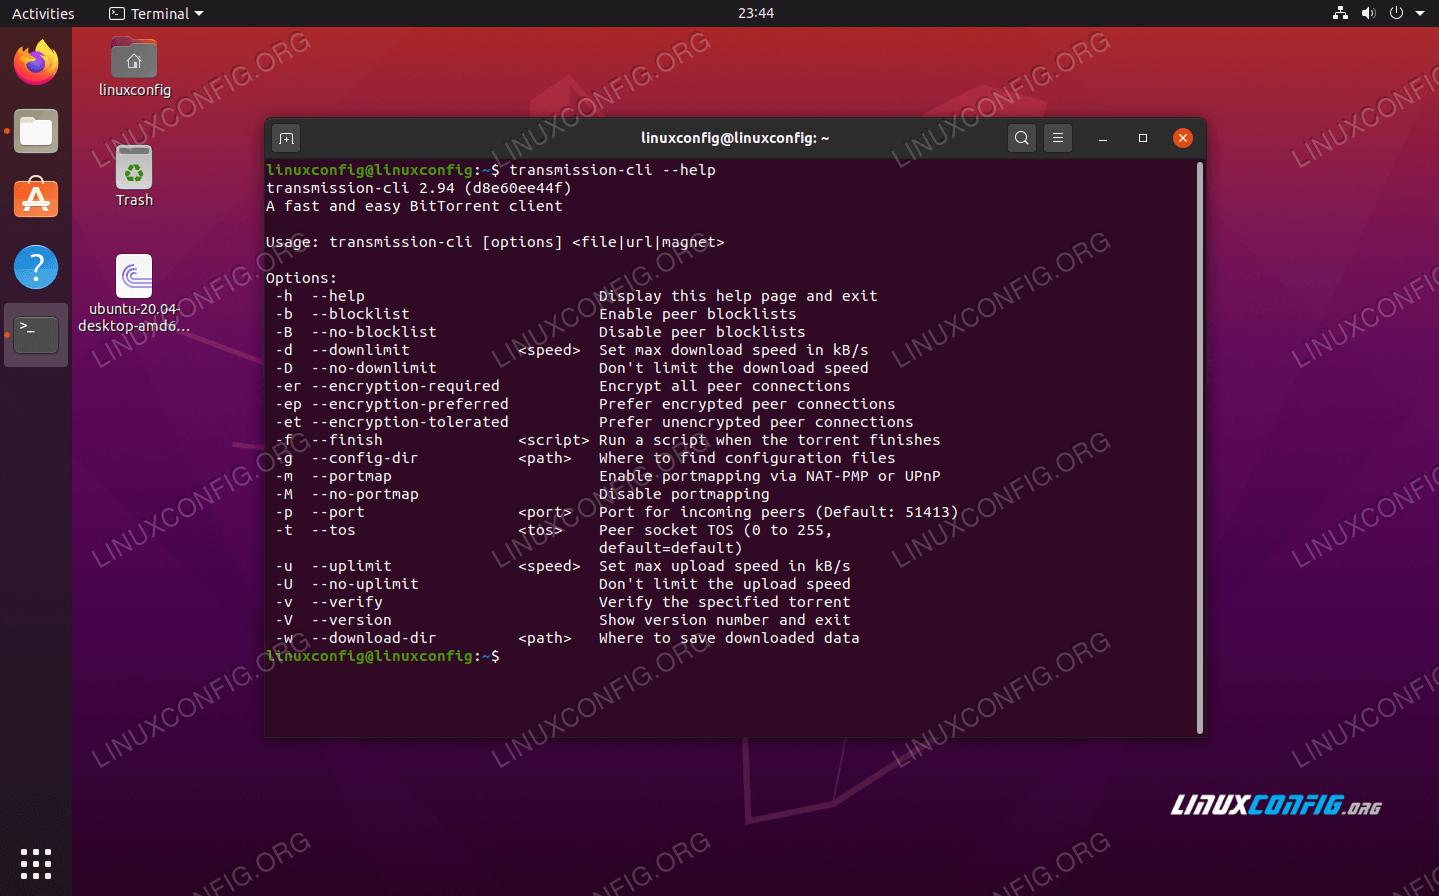 Transmission-CLI torrent client options